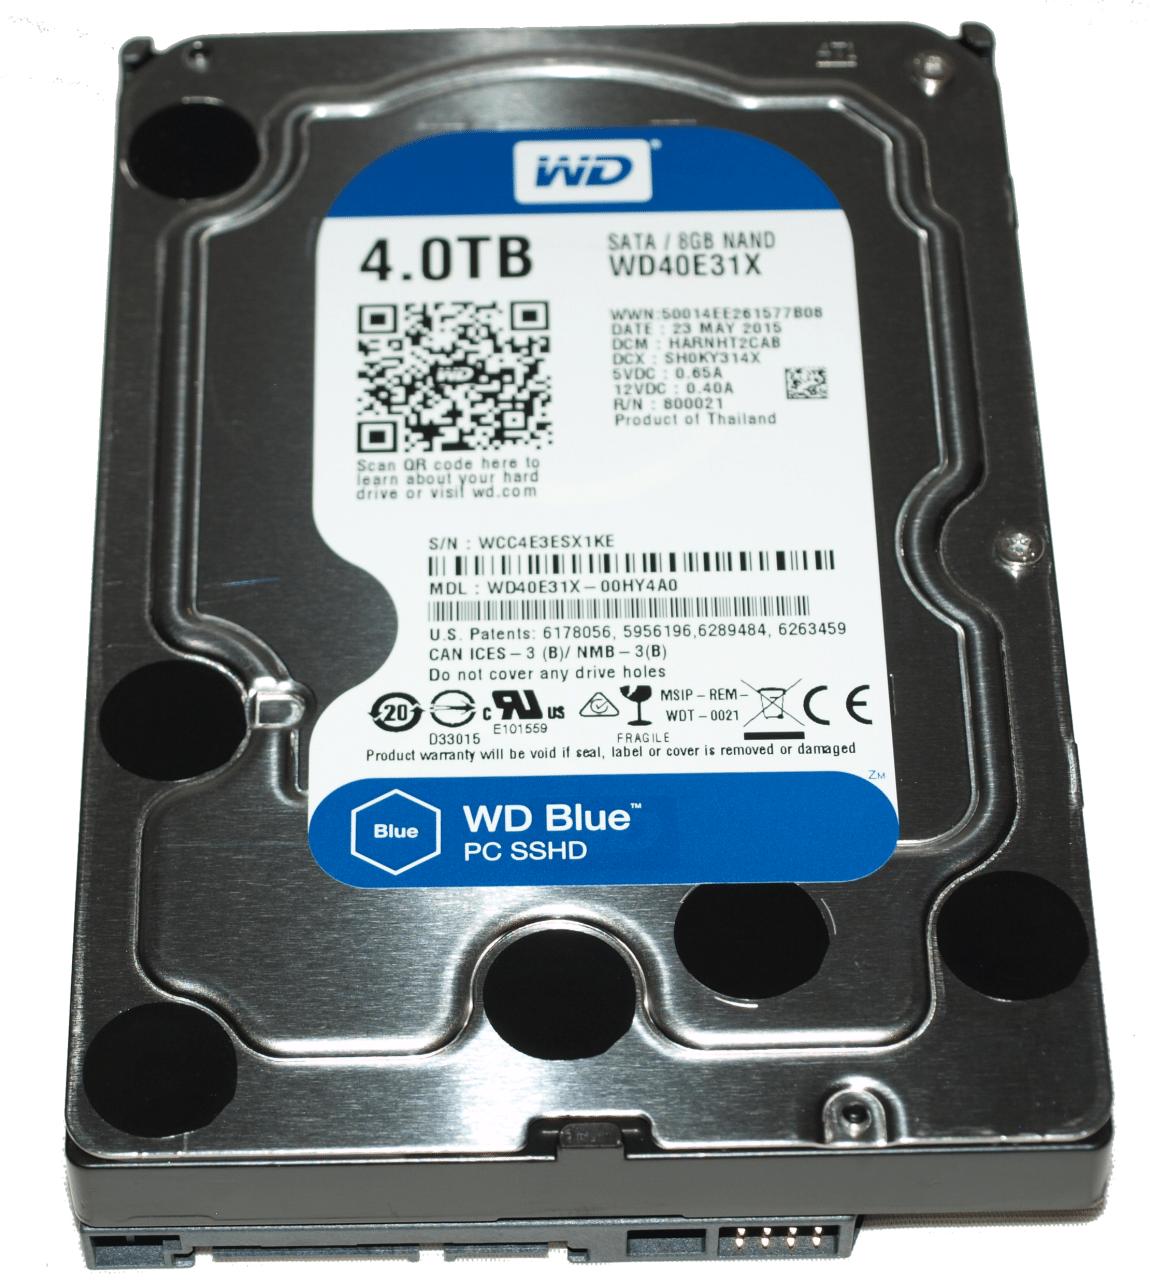 Western Digital Blue 4TB SSHD (WD40E31X) Platter & SSD Ride The ...